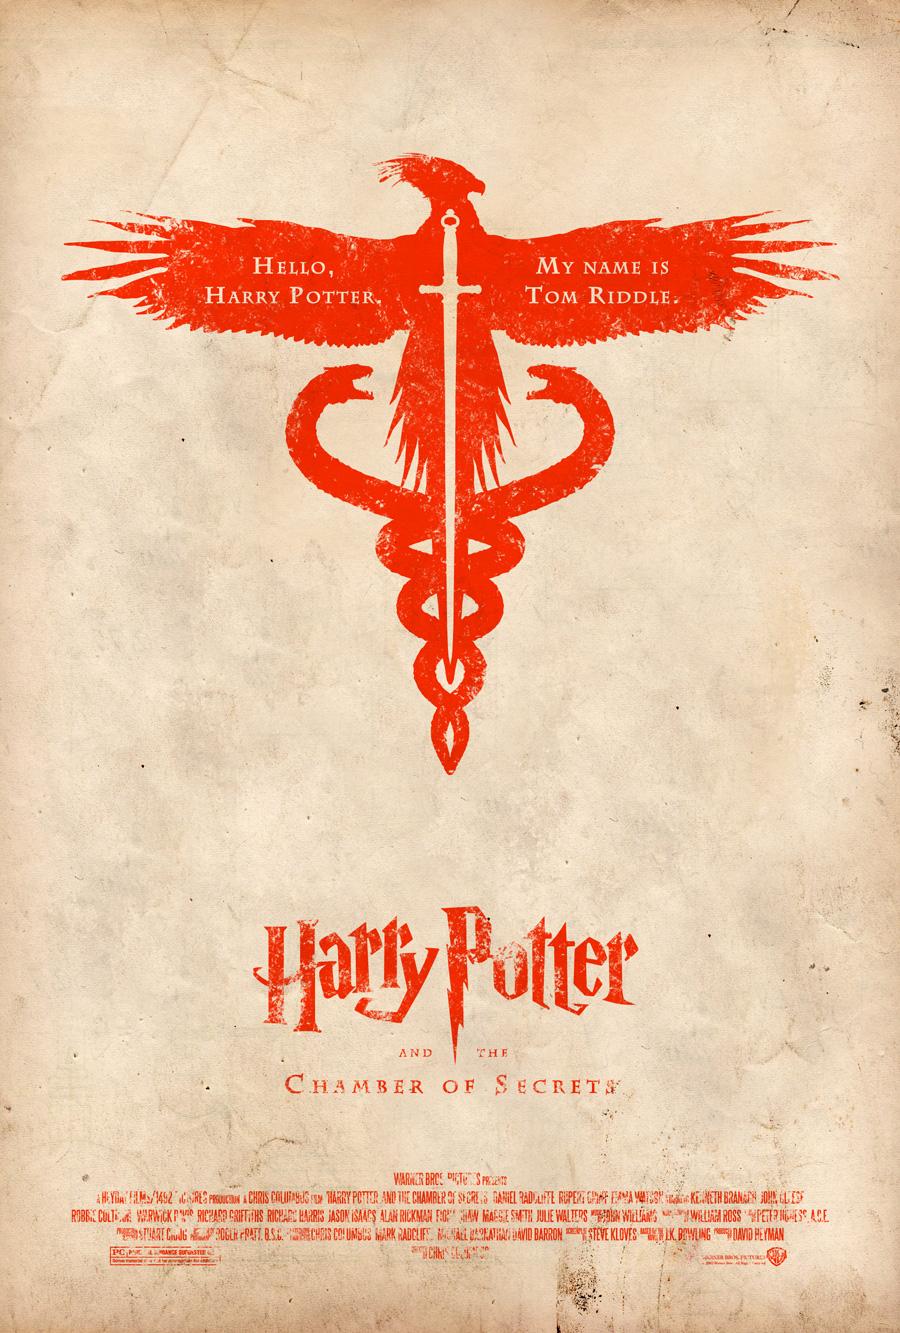 Harry Potter COS Poster by adamrabalais